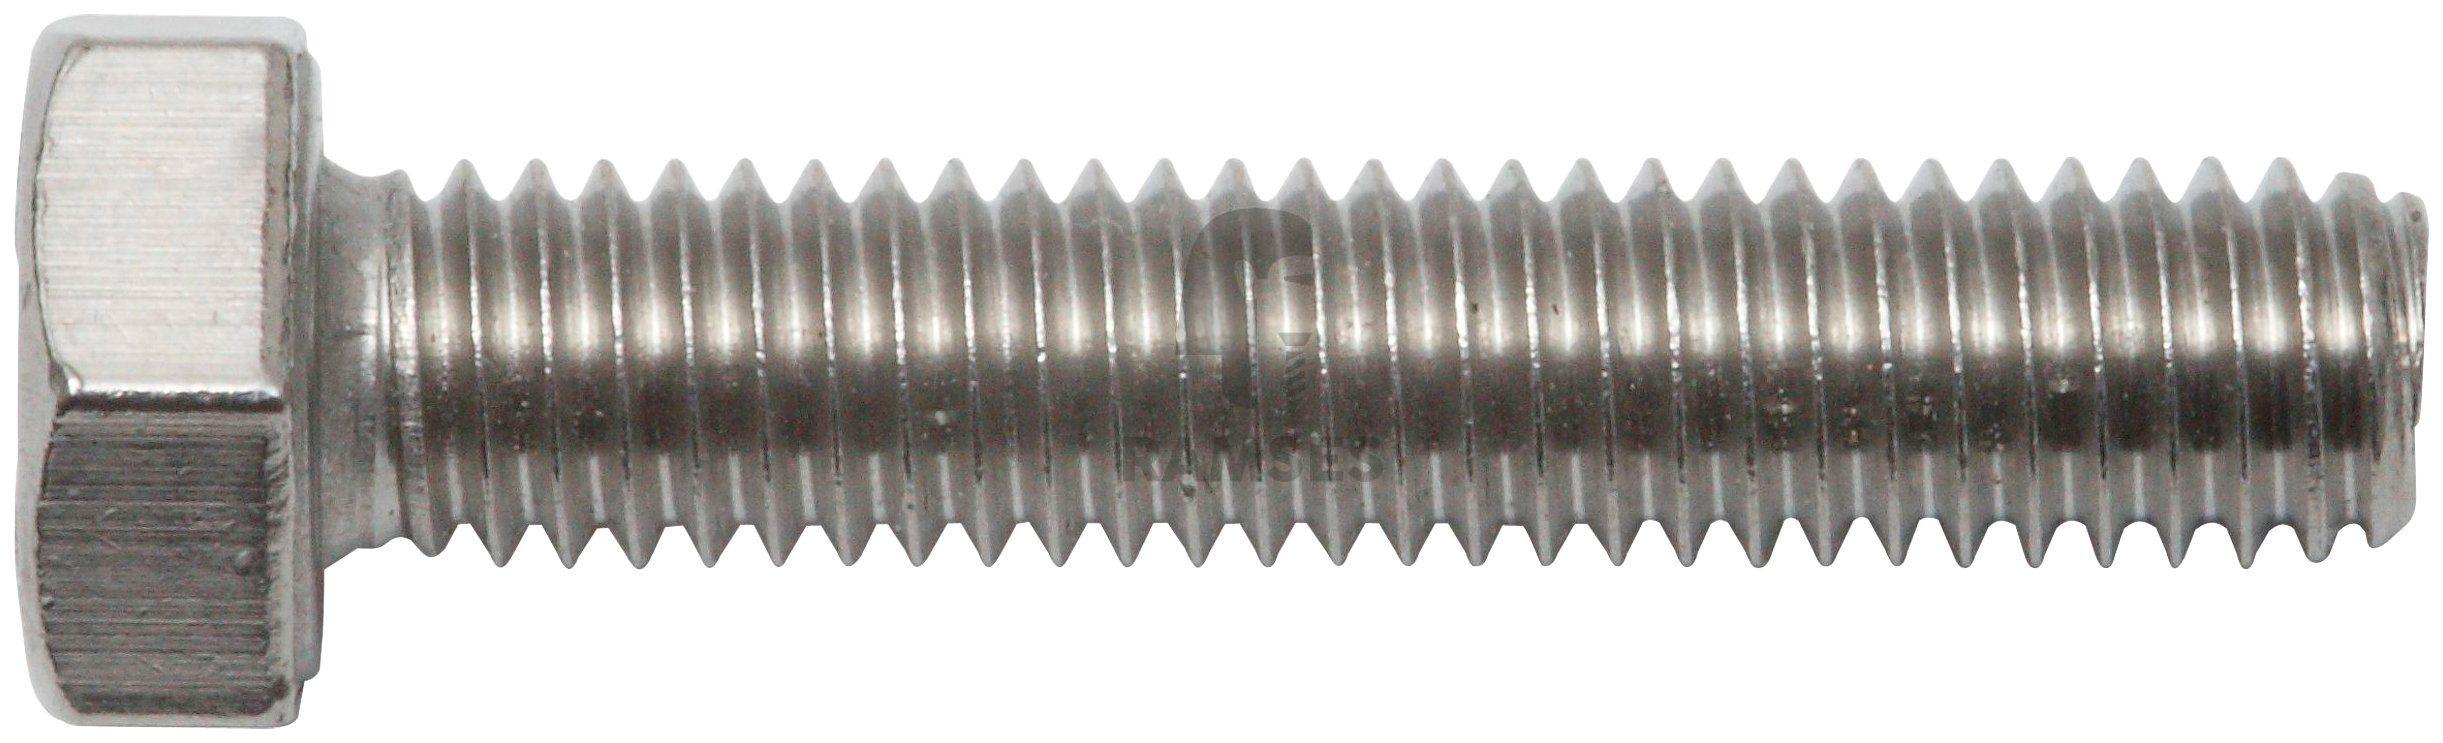 RAMSES Schrauben , Sechskantschraube M10 x 80 mm 20 Stk.